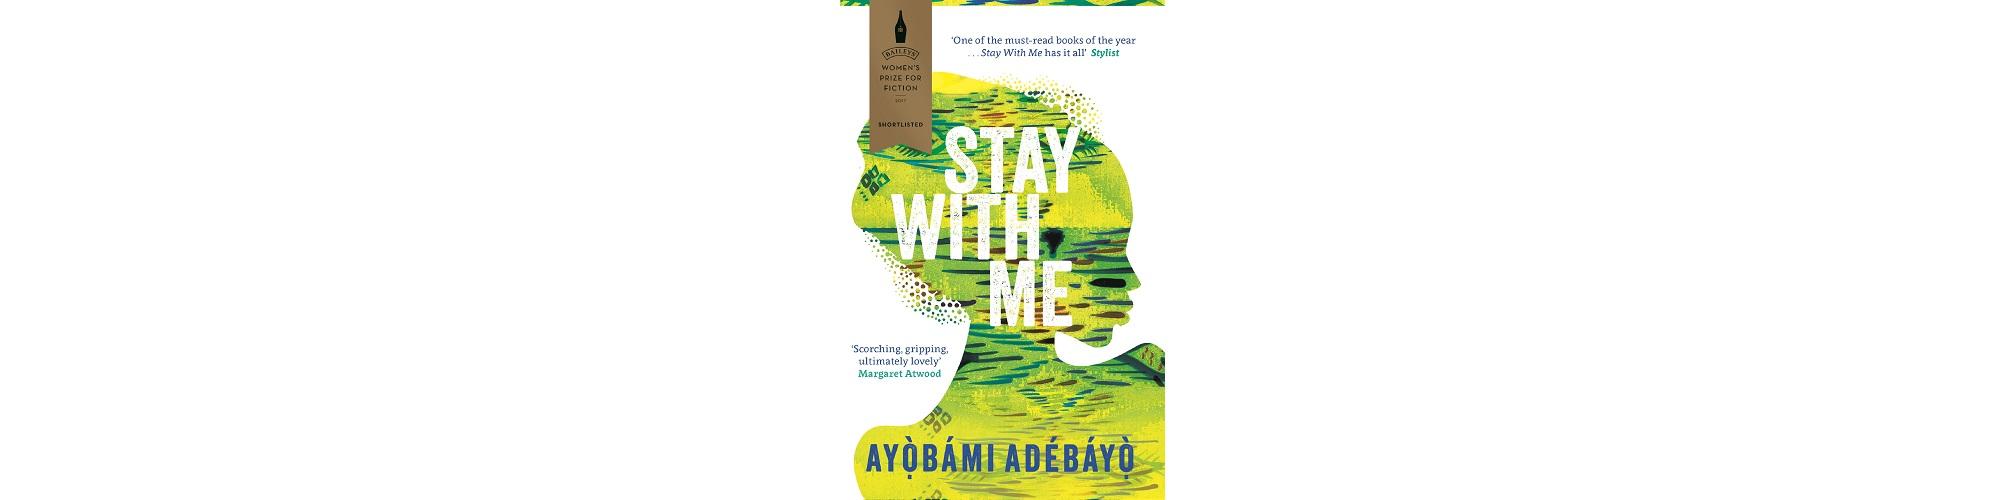 Stay With Me by Ayọ̀bámi Adébáyọ̀ book cover